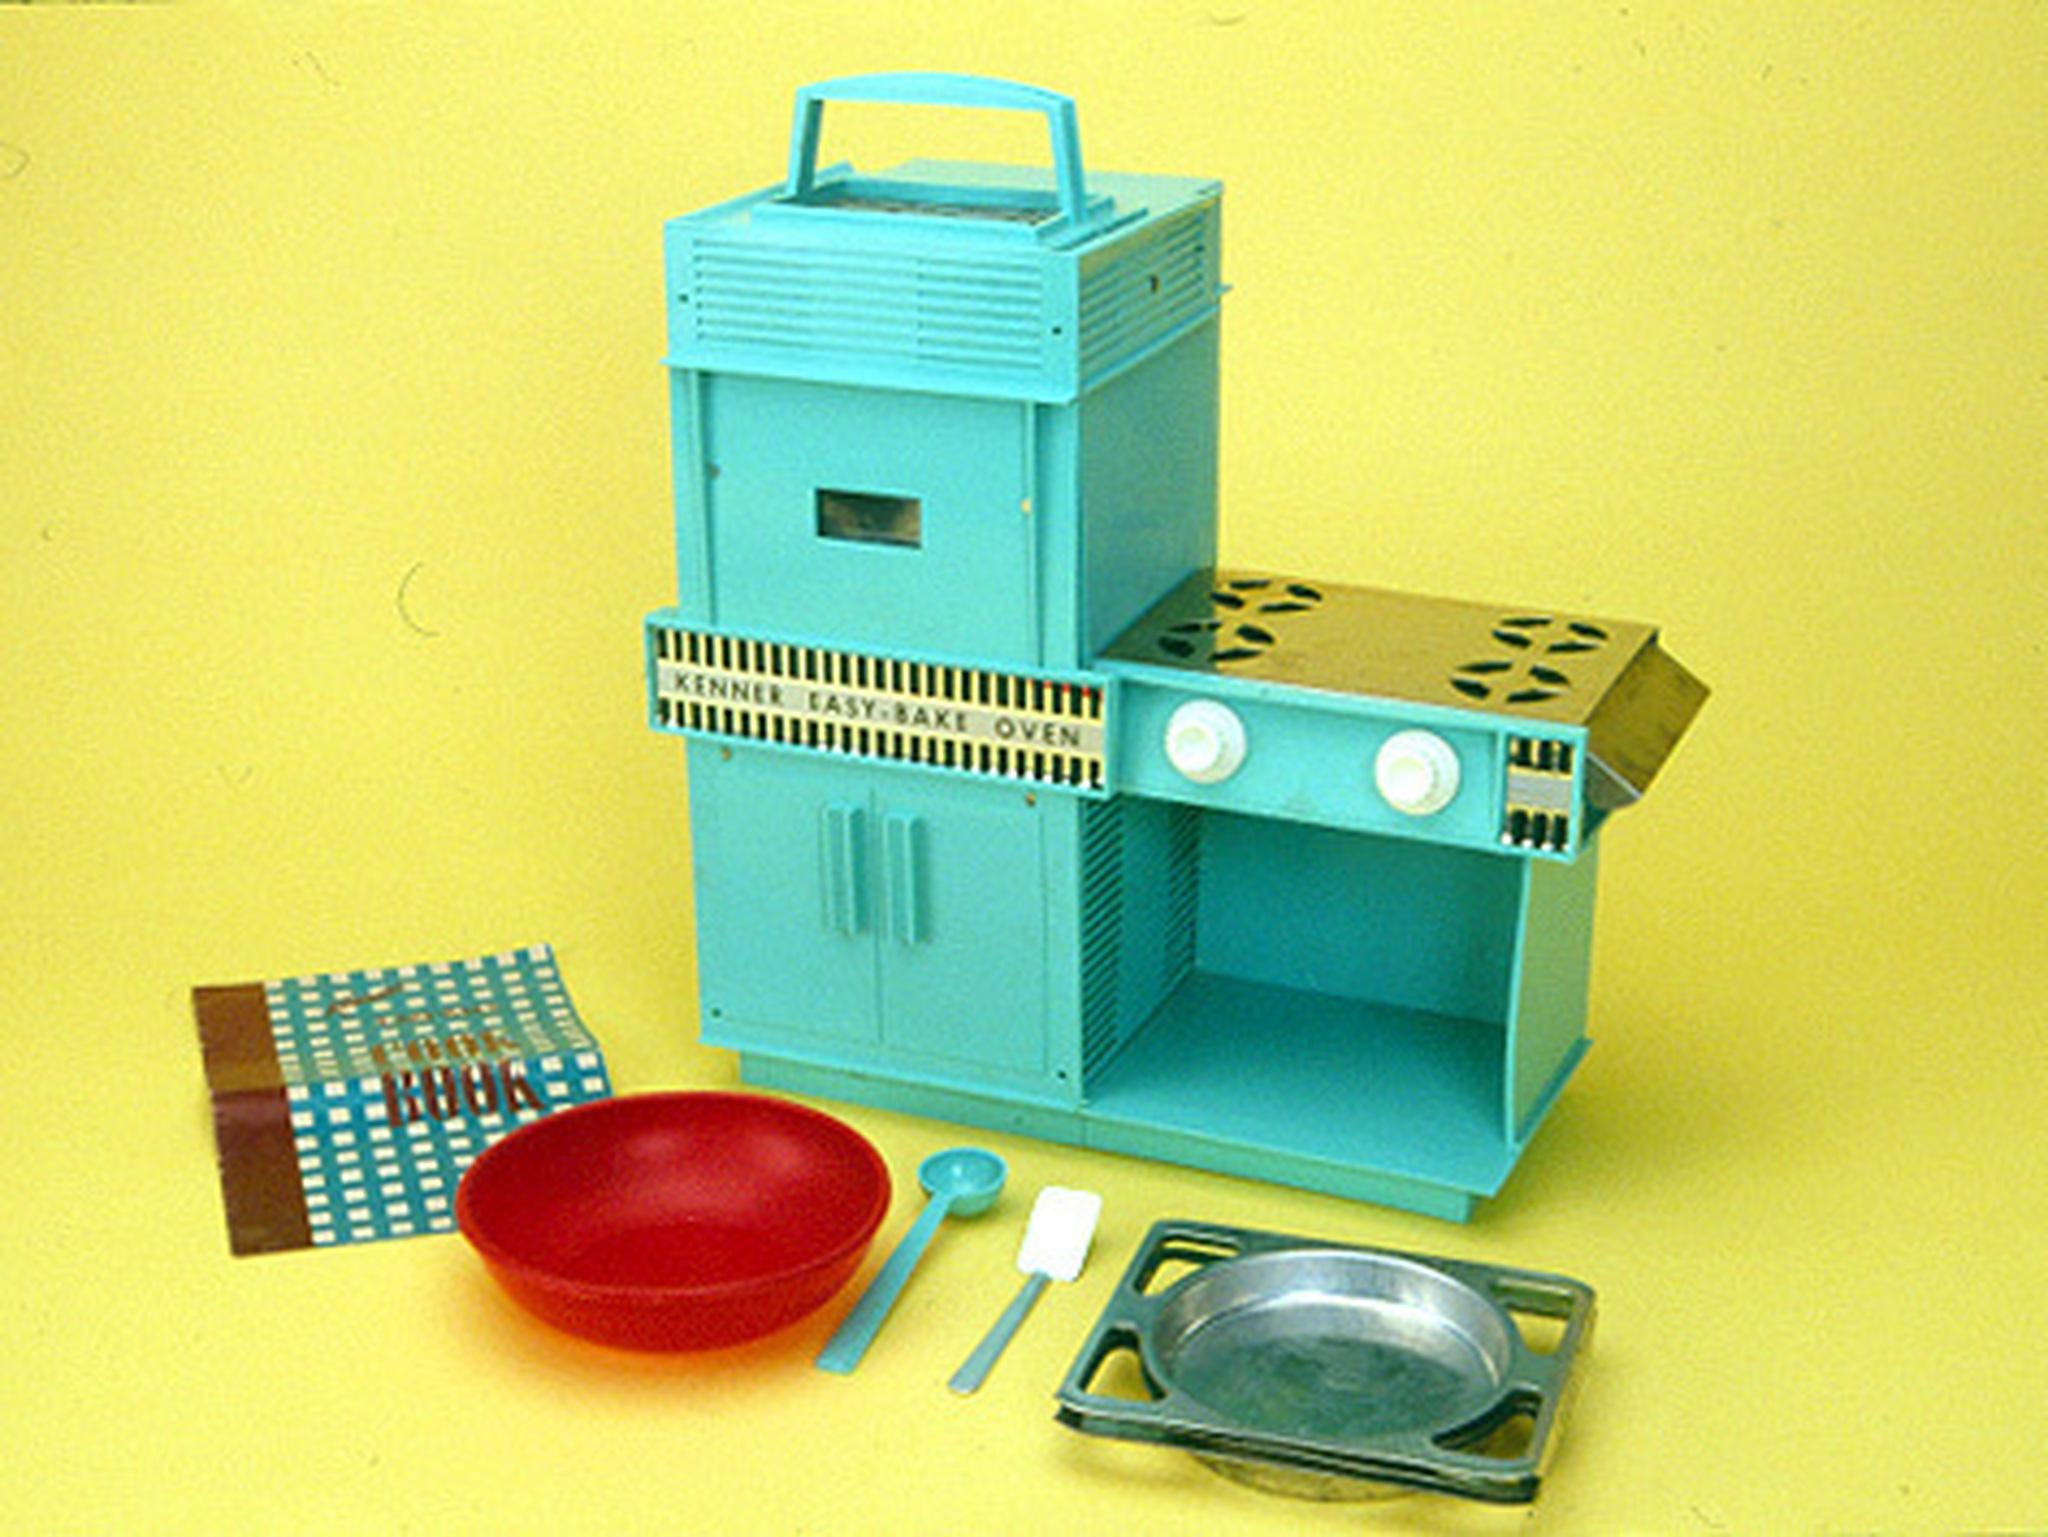 Tiny Ovens For Tots: A Kitchen Evolution | New Hampshire Public Radio